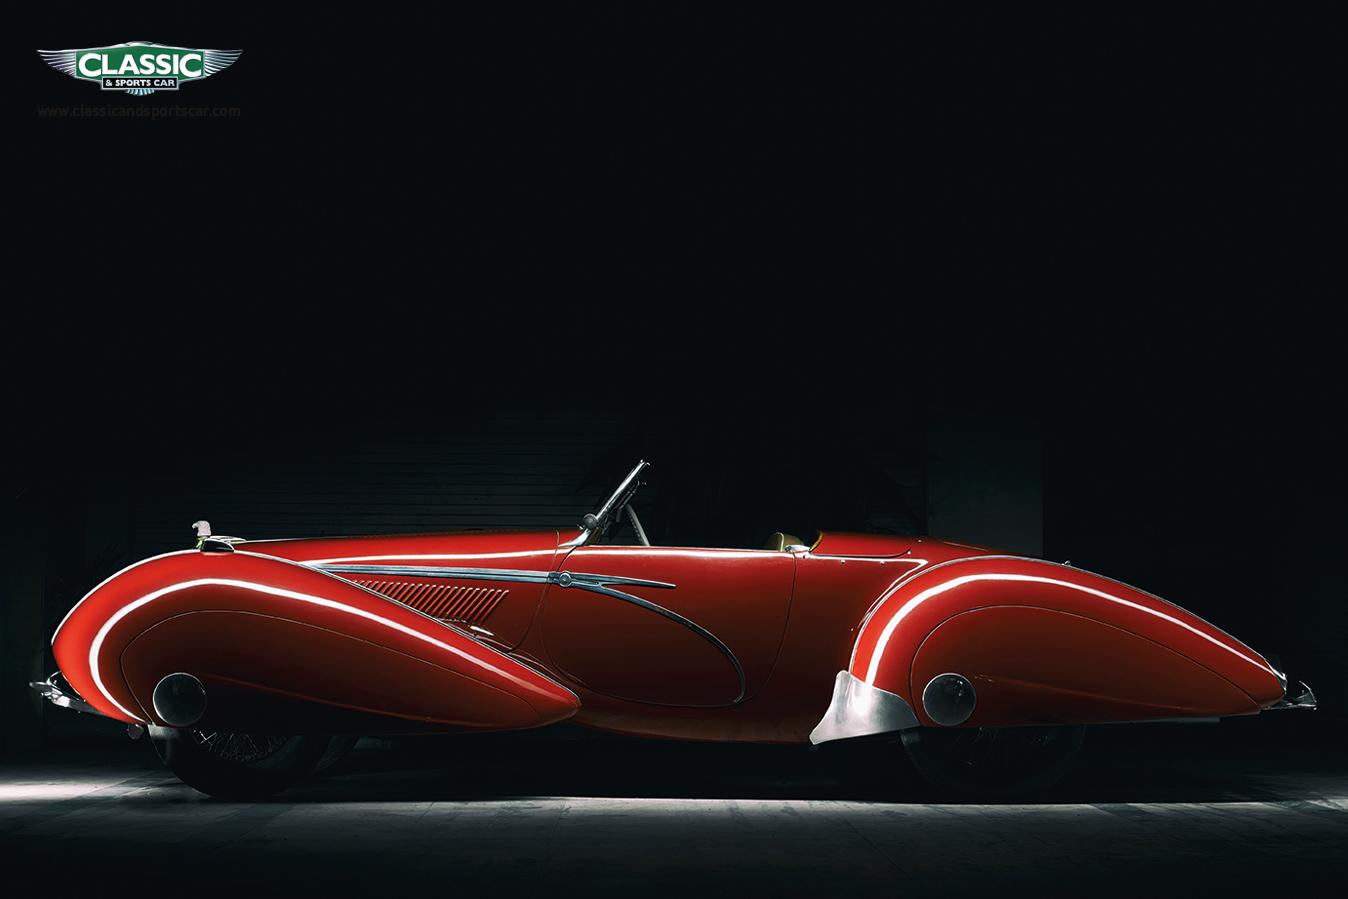 Best desktop wallpapers cars classic sports car - Best classic wallpaper ...